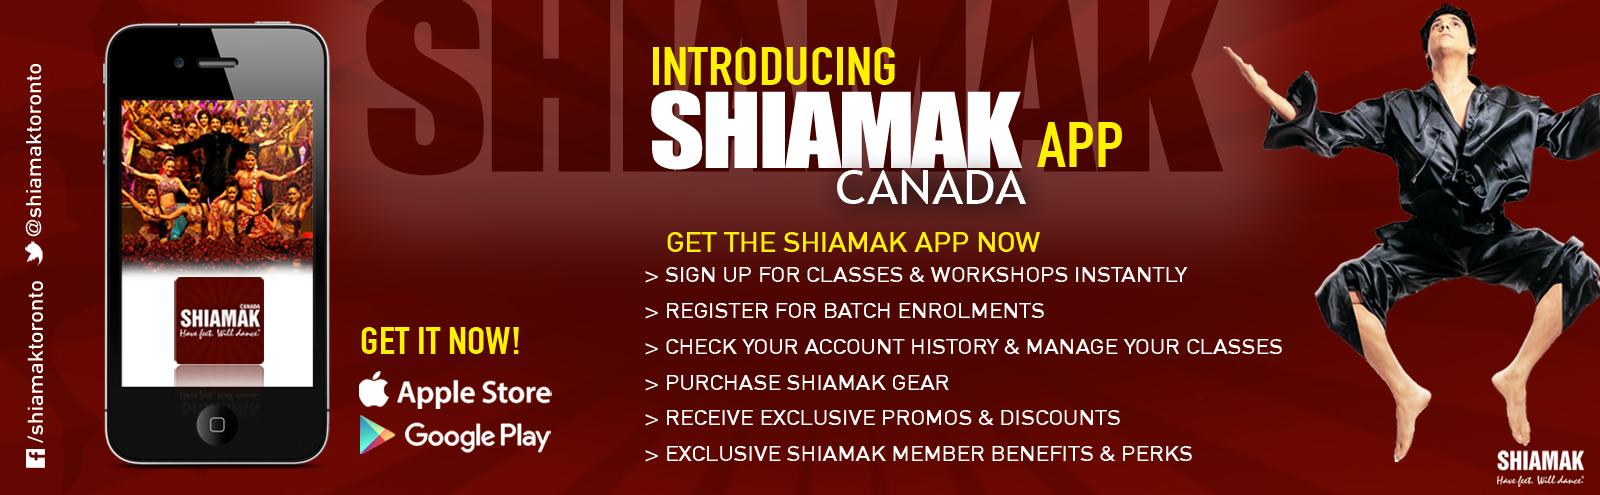 Introducing - The SHIAMAK App